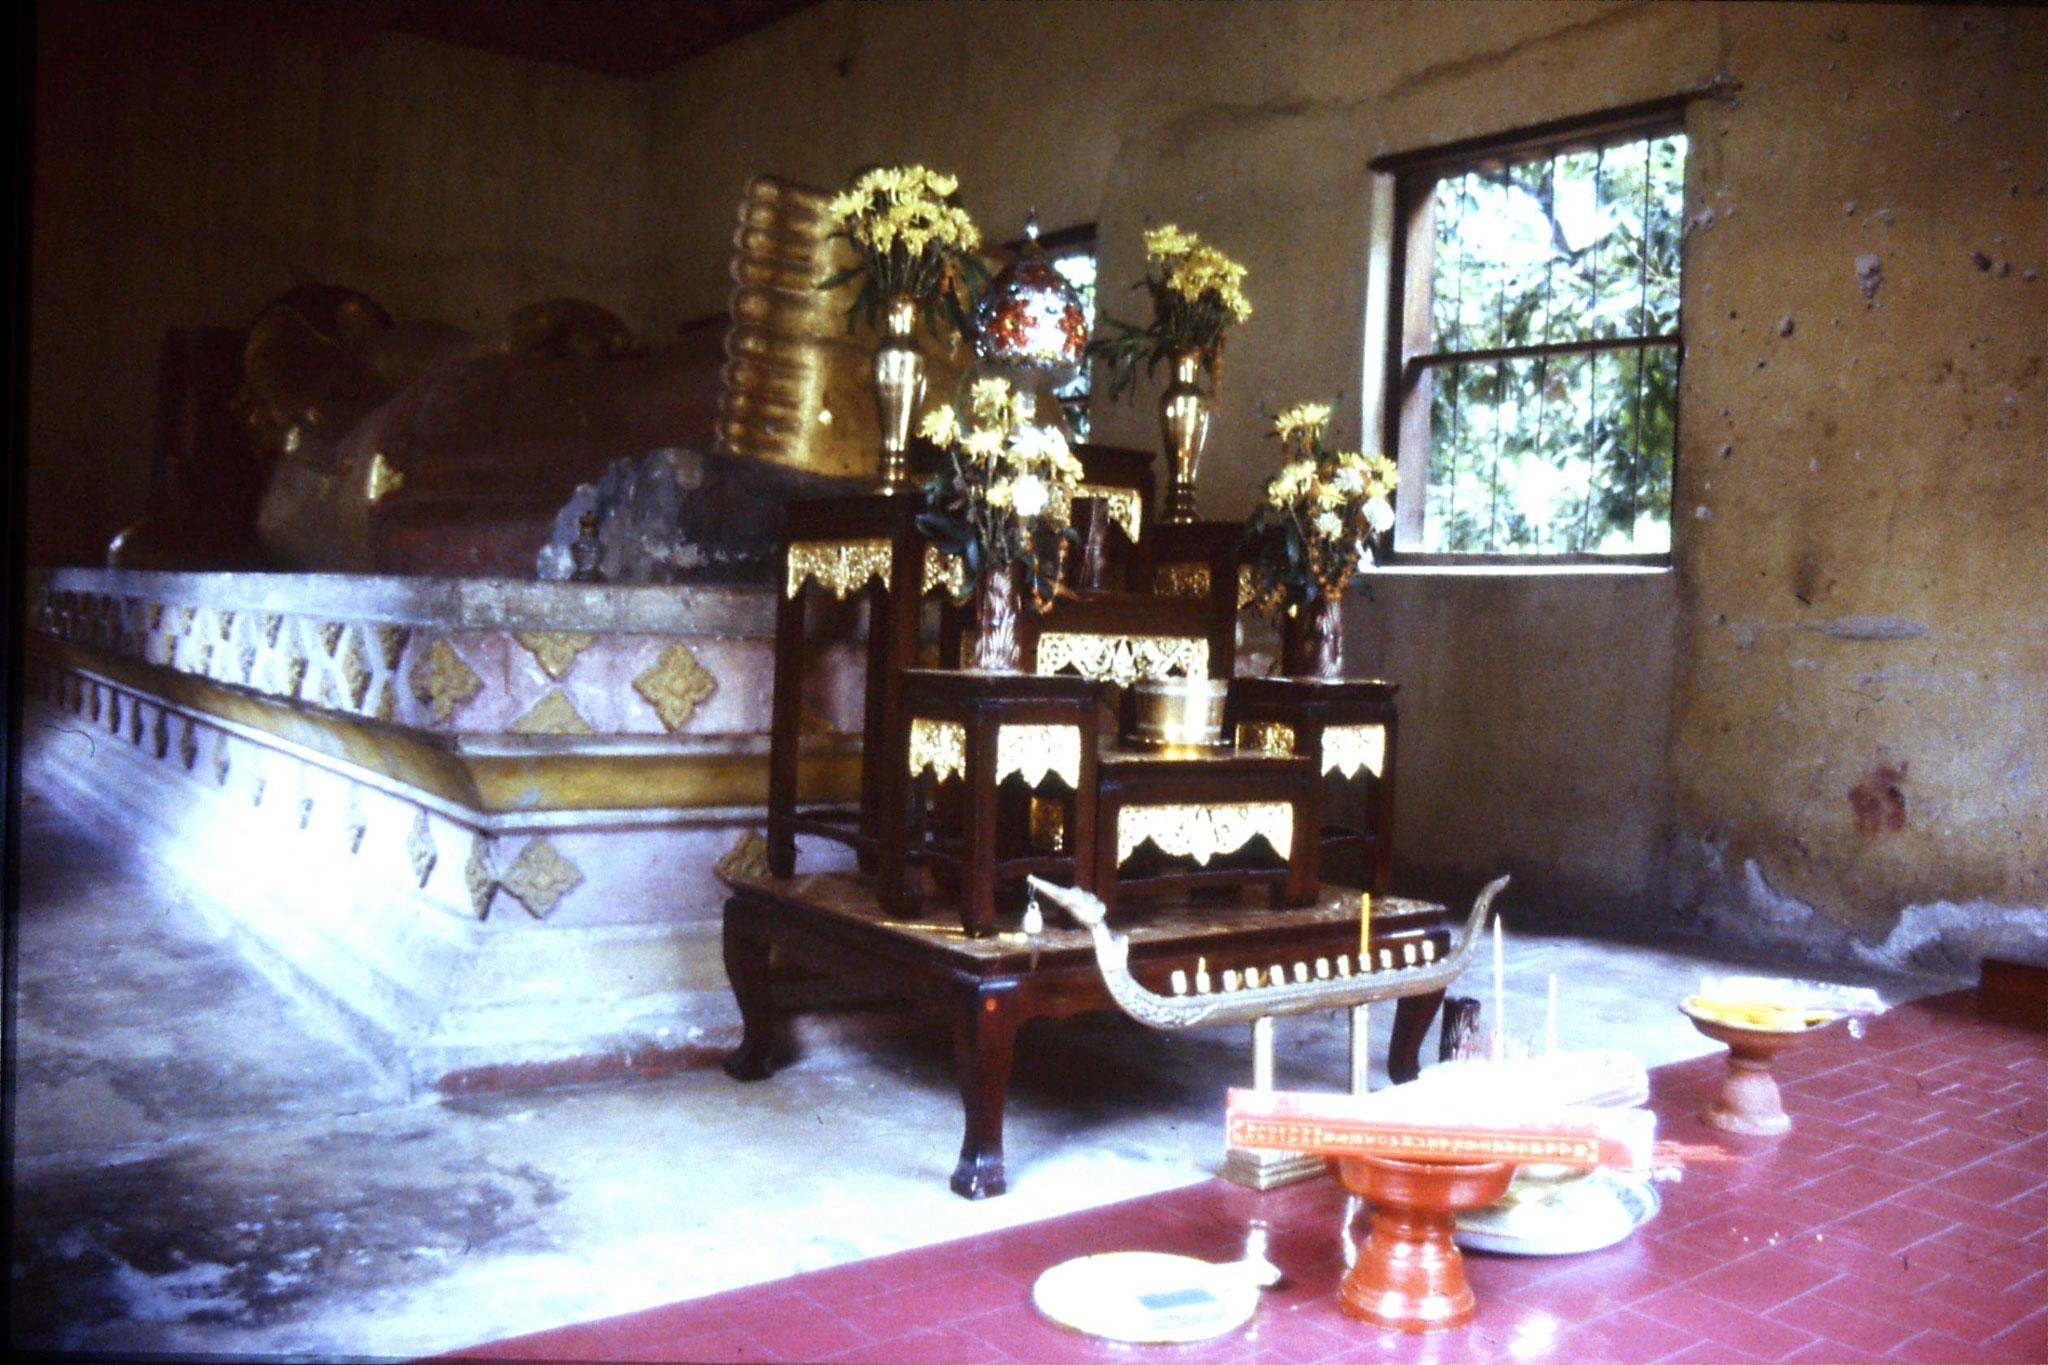 14/6/1990: 1: Chang Mai, Wat Phra Singh